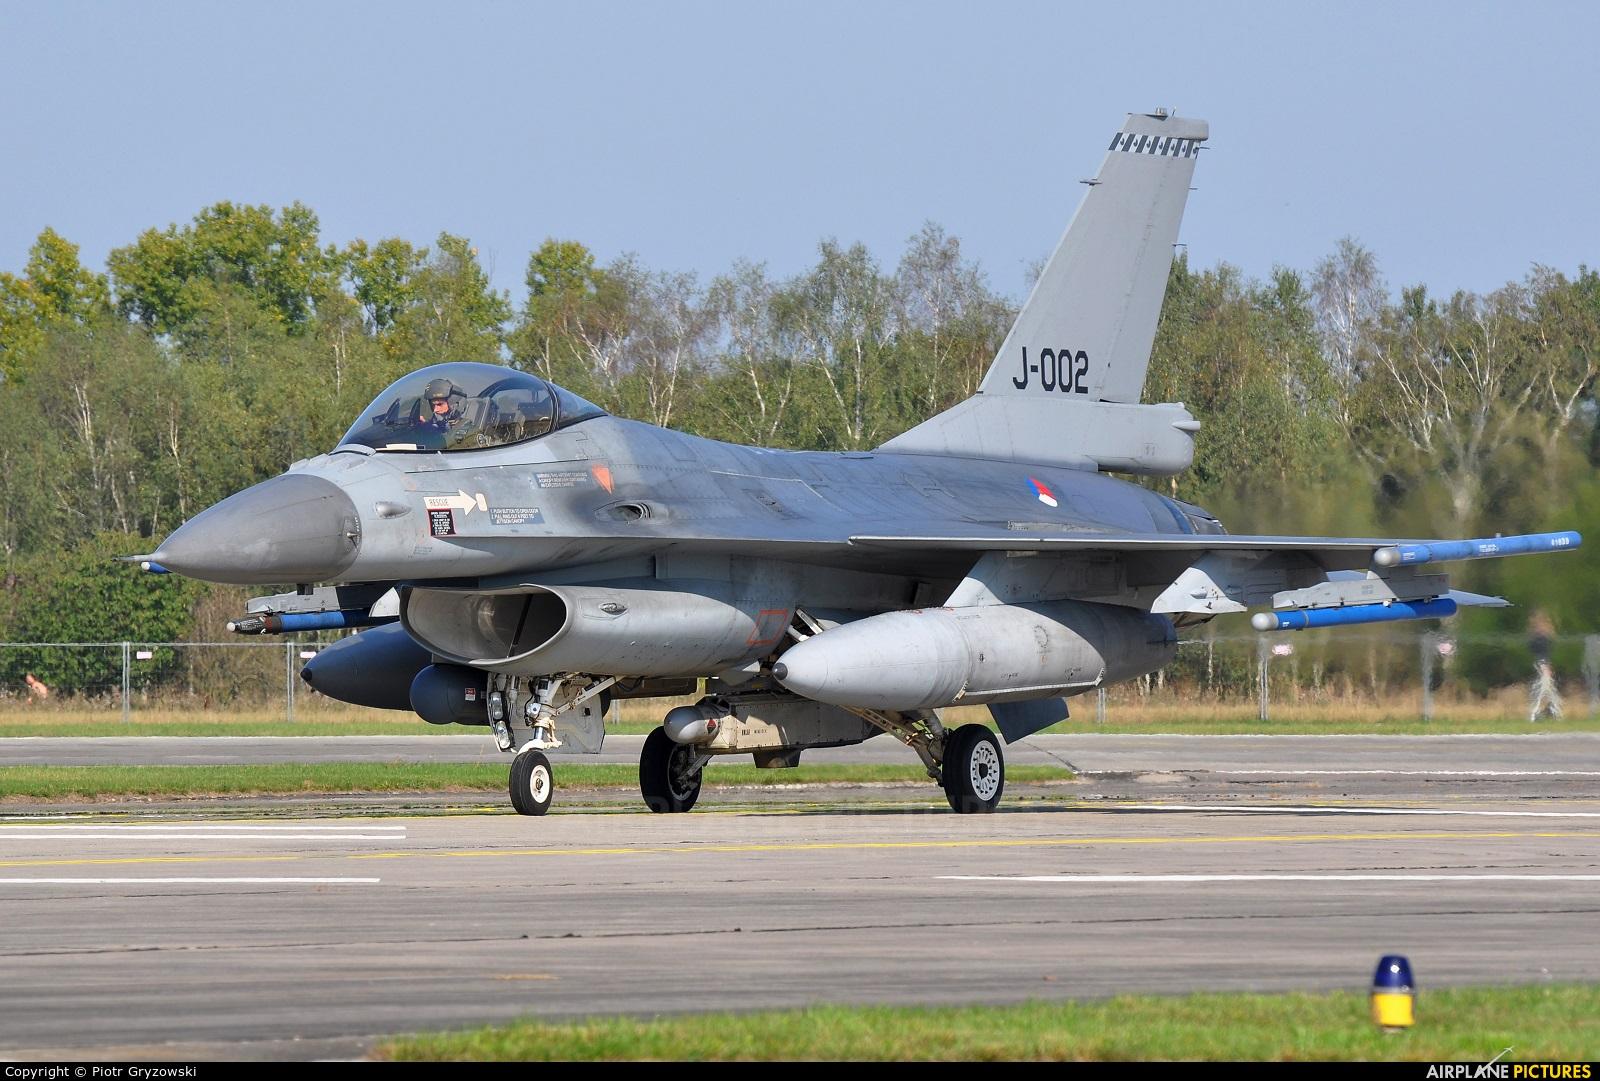 Netherlands - Air Force J-002 aircraft at Hradec Králové